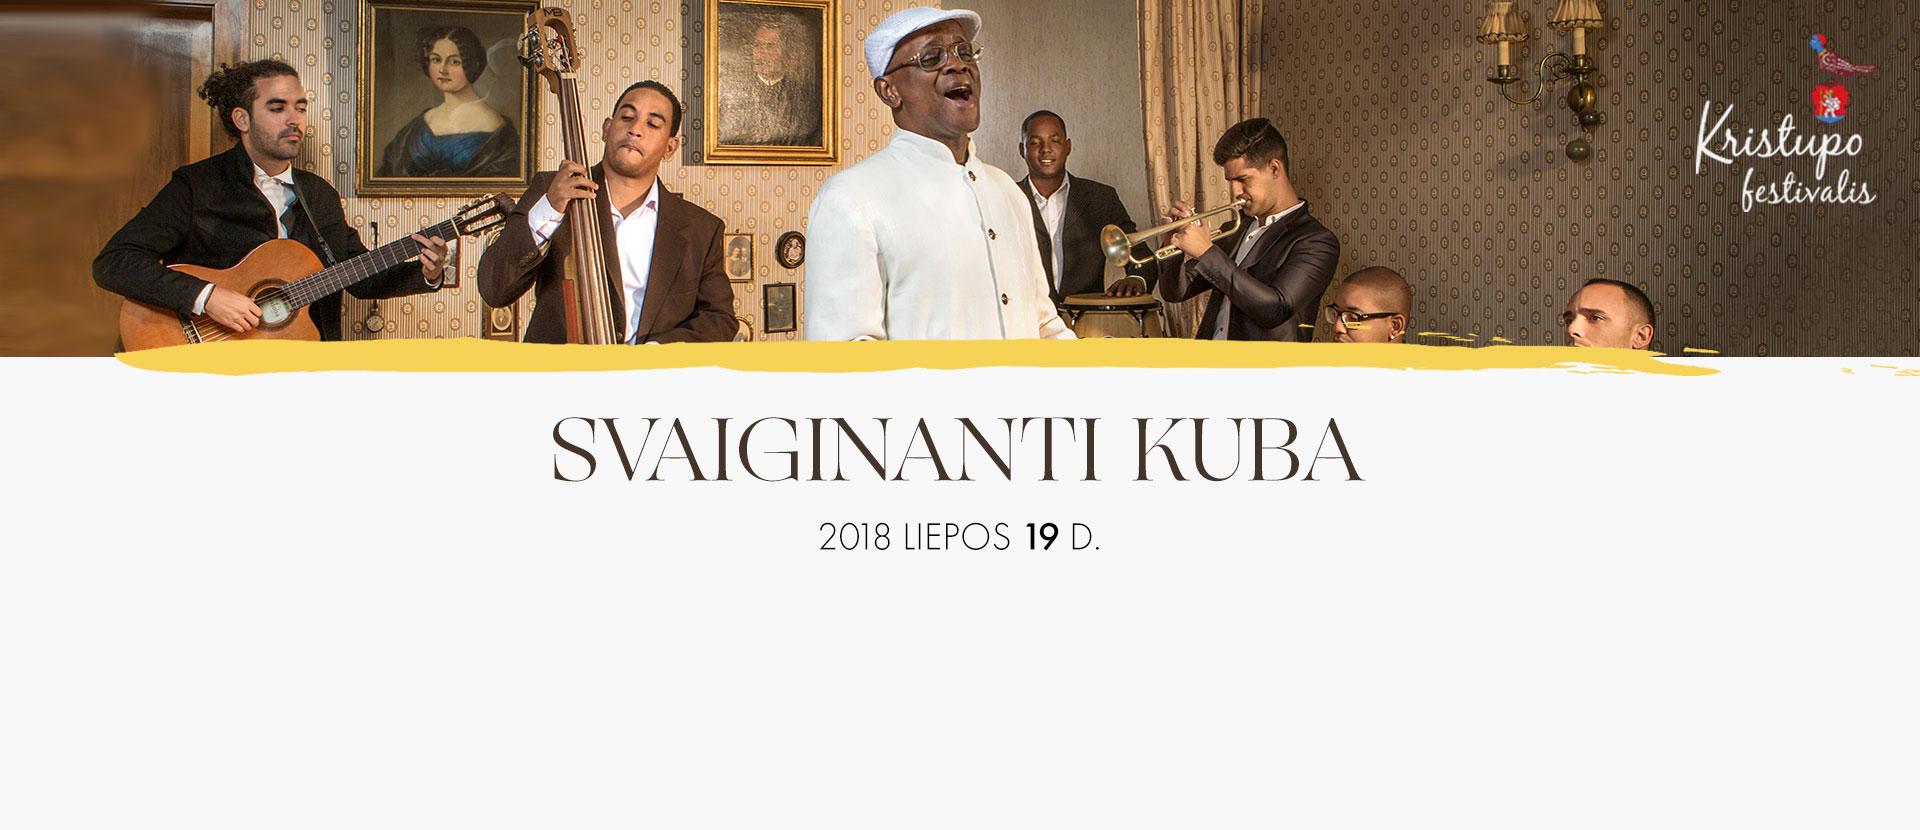 Kristupo festivalis: SVAIGINANTI KUBA Latin Grammy laureatai